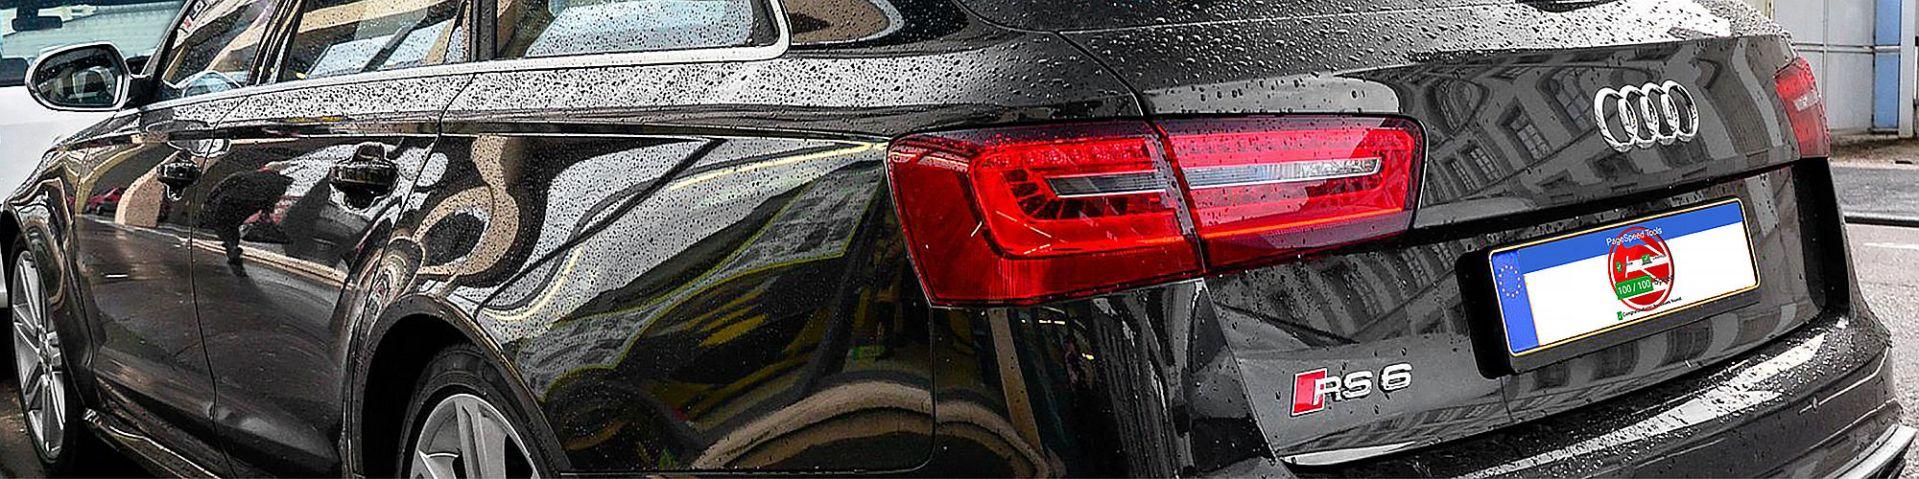 WordPress Full Optimization Performance & Speed Service - Audi_RS6 - 2 - Optimized Header Image